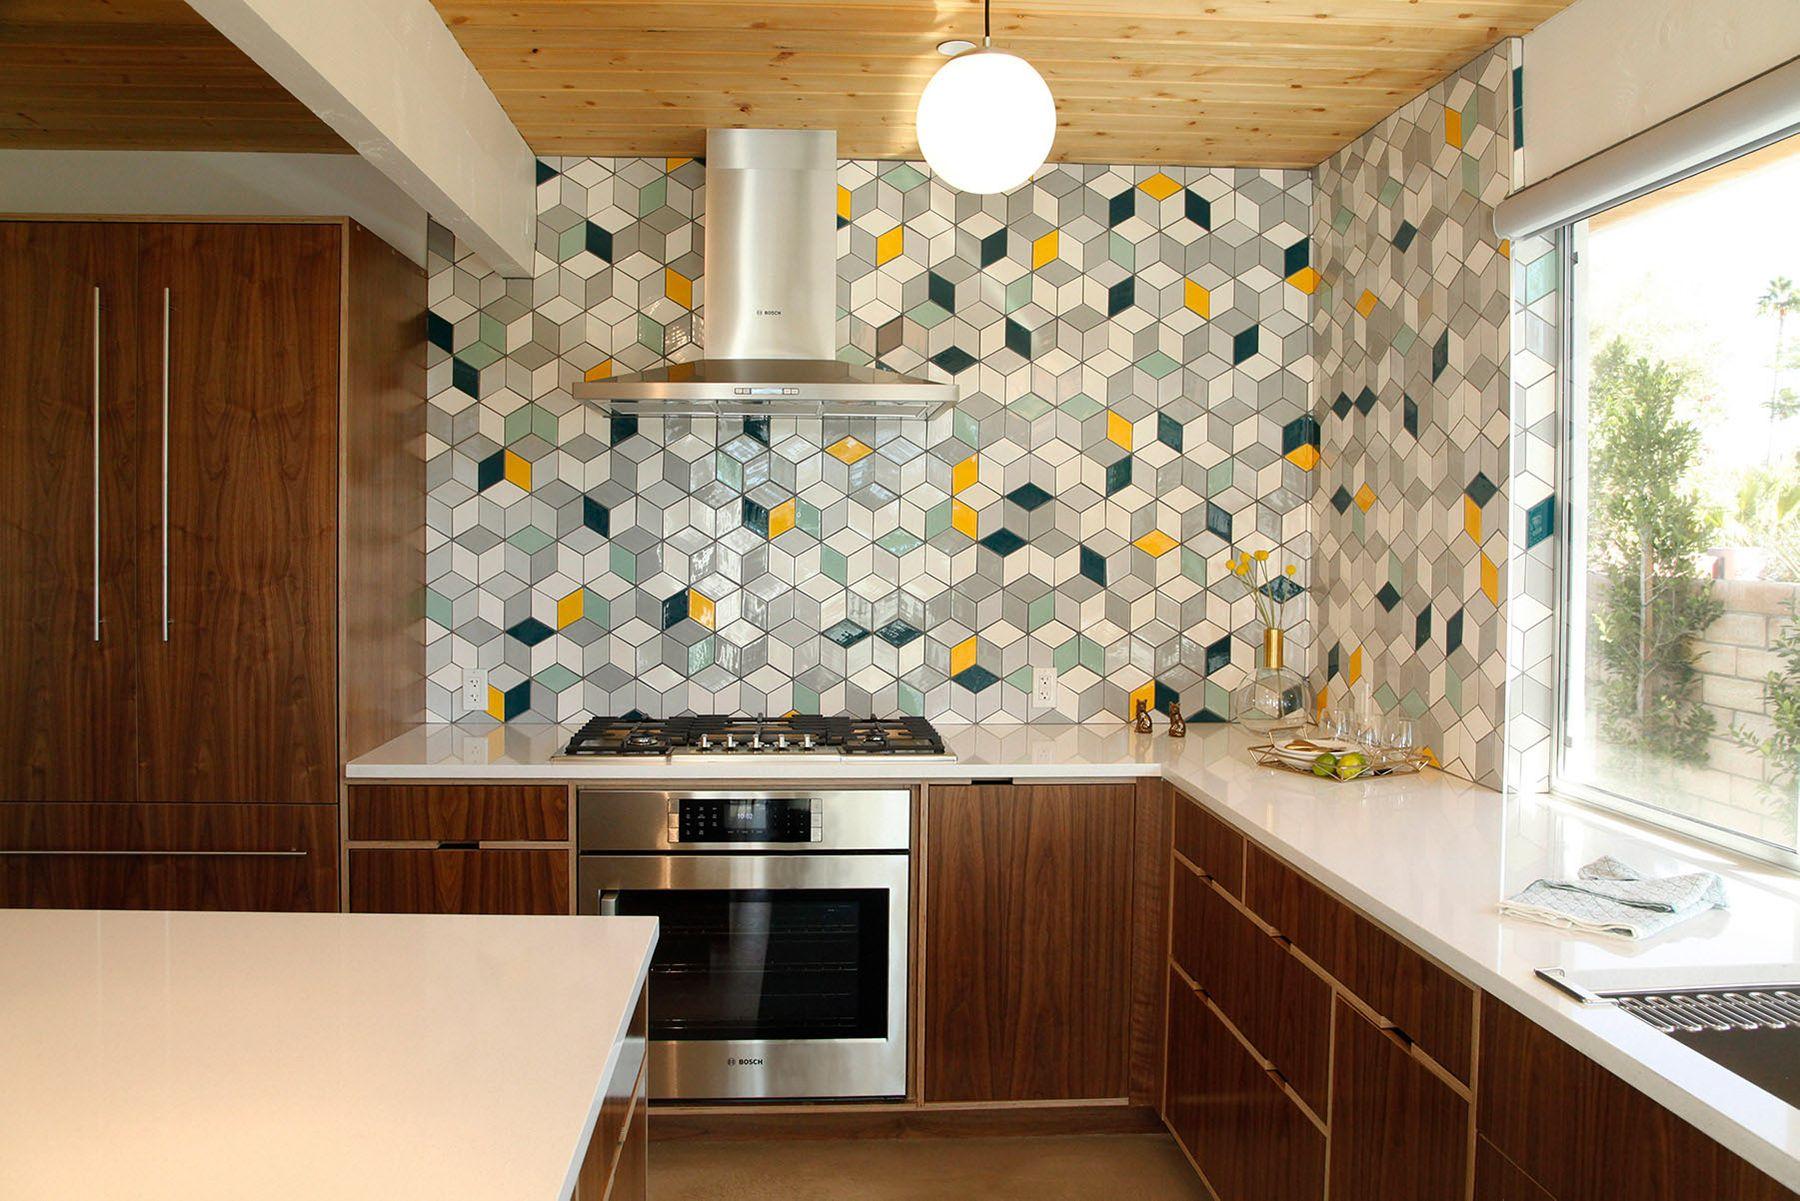 Kitchens & Dining 31.jpg